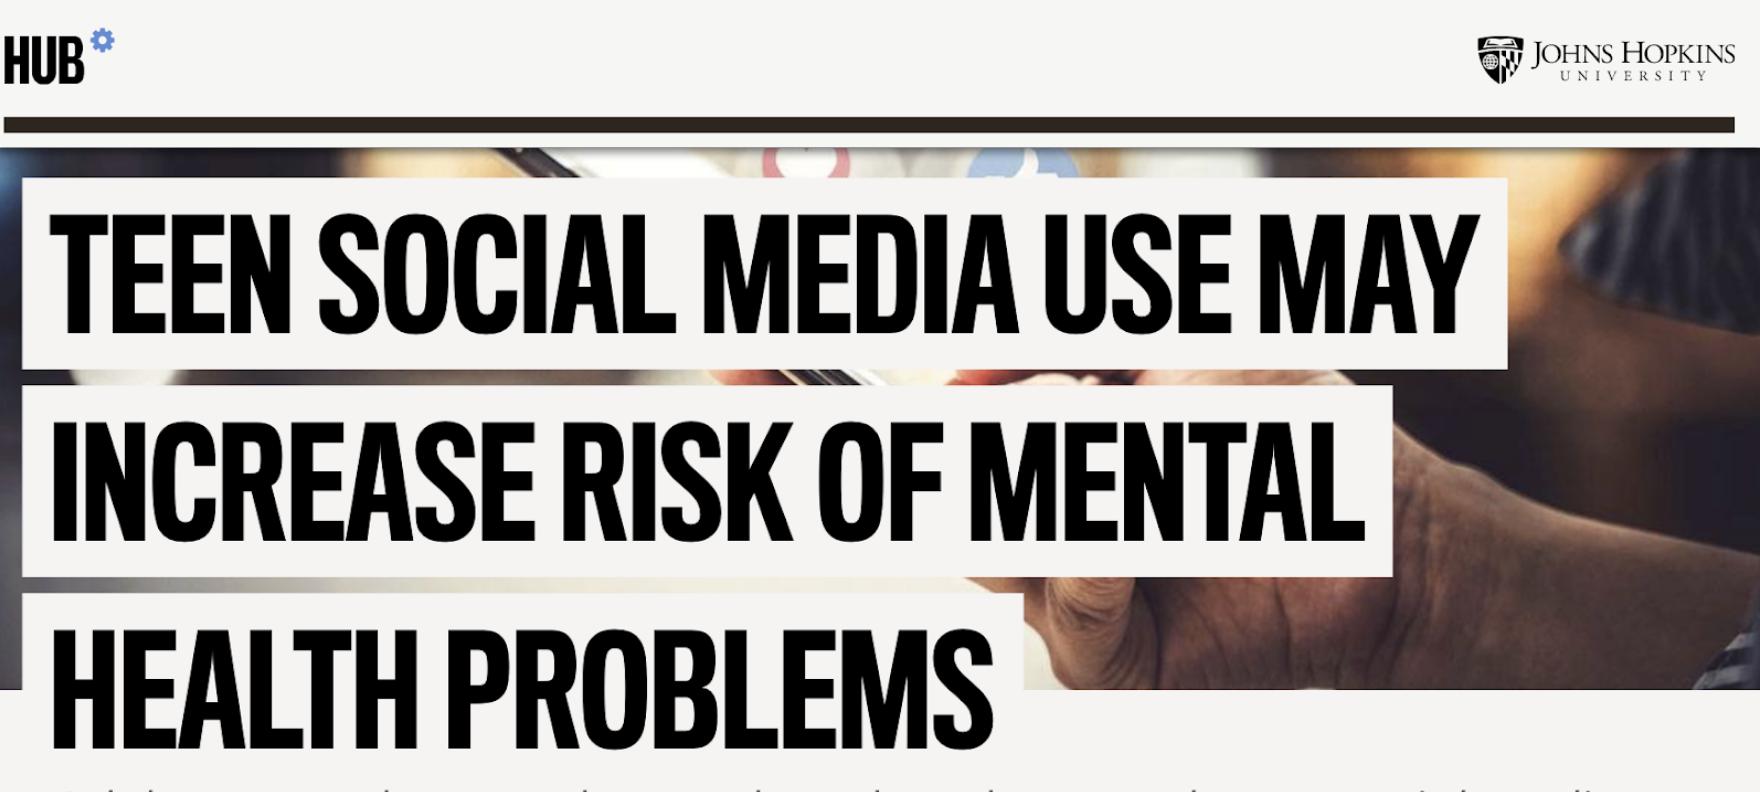 John Hopkins on Teen Mental Health